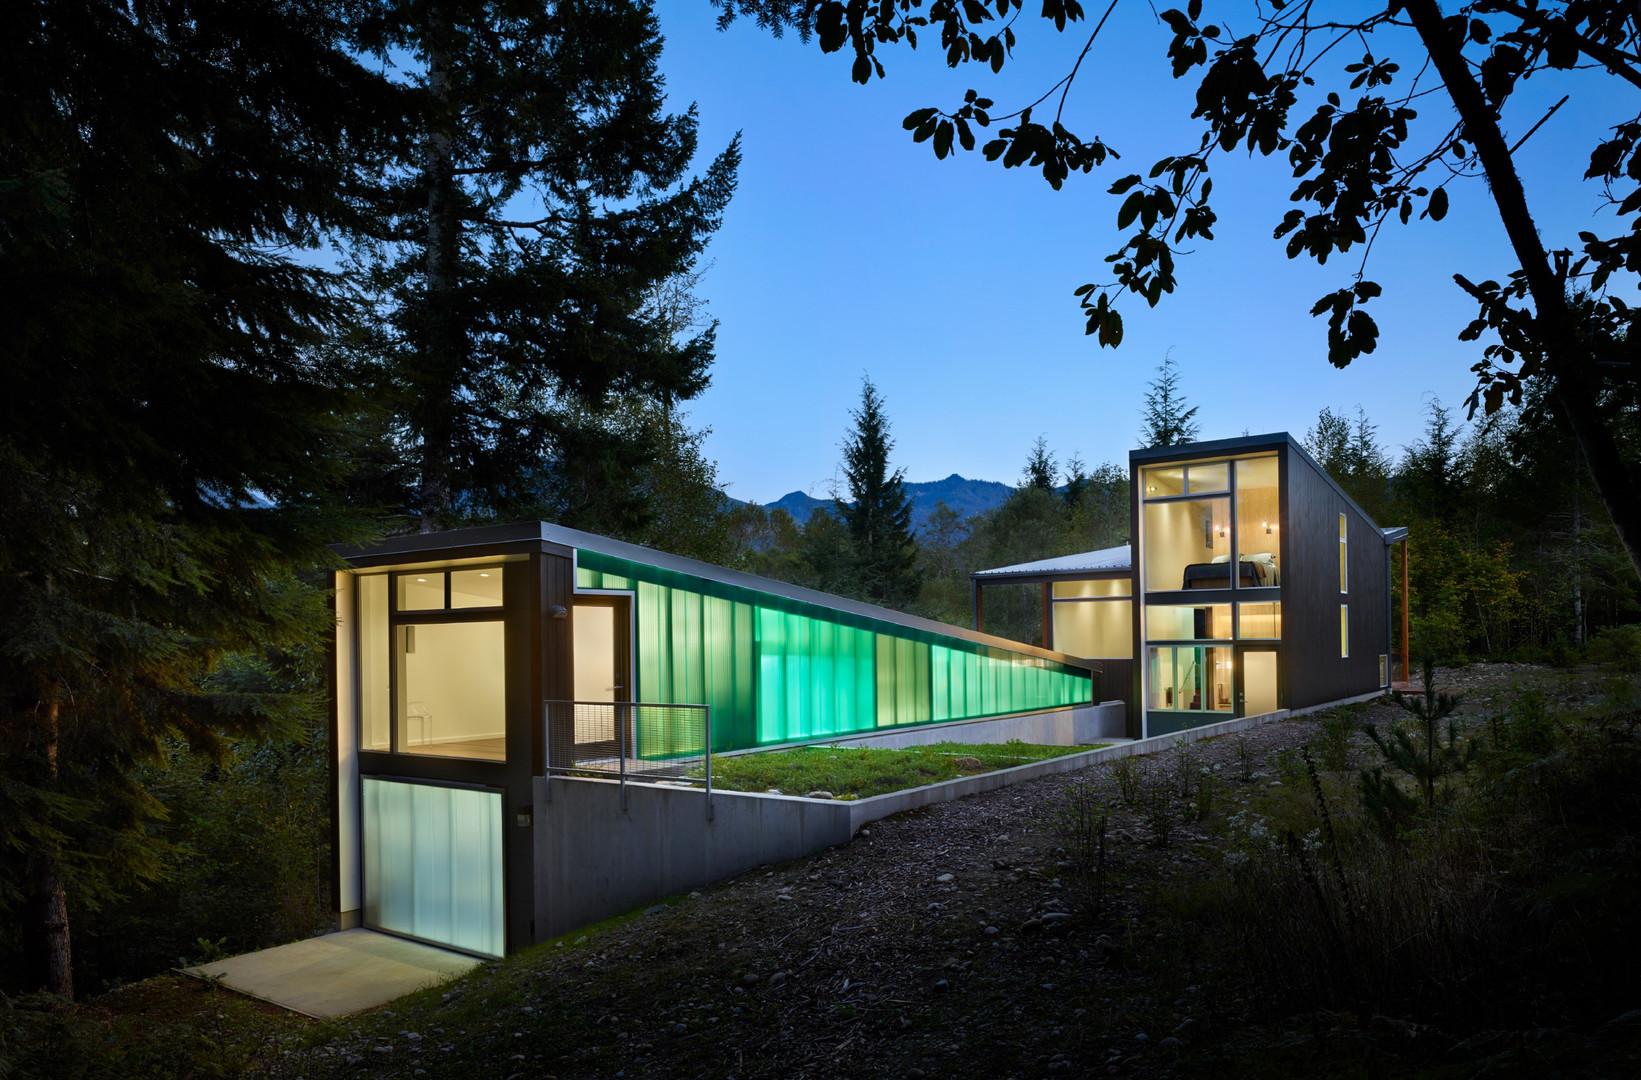 ARCHITECTURE, Residential: Bear Run Cabin